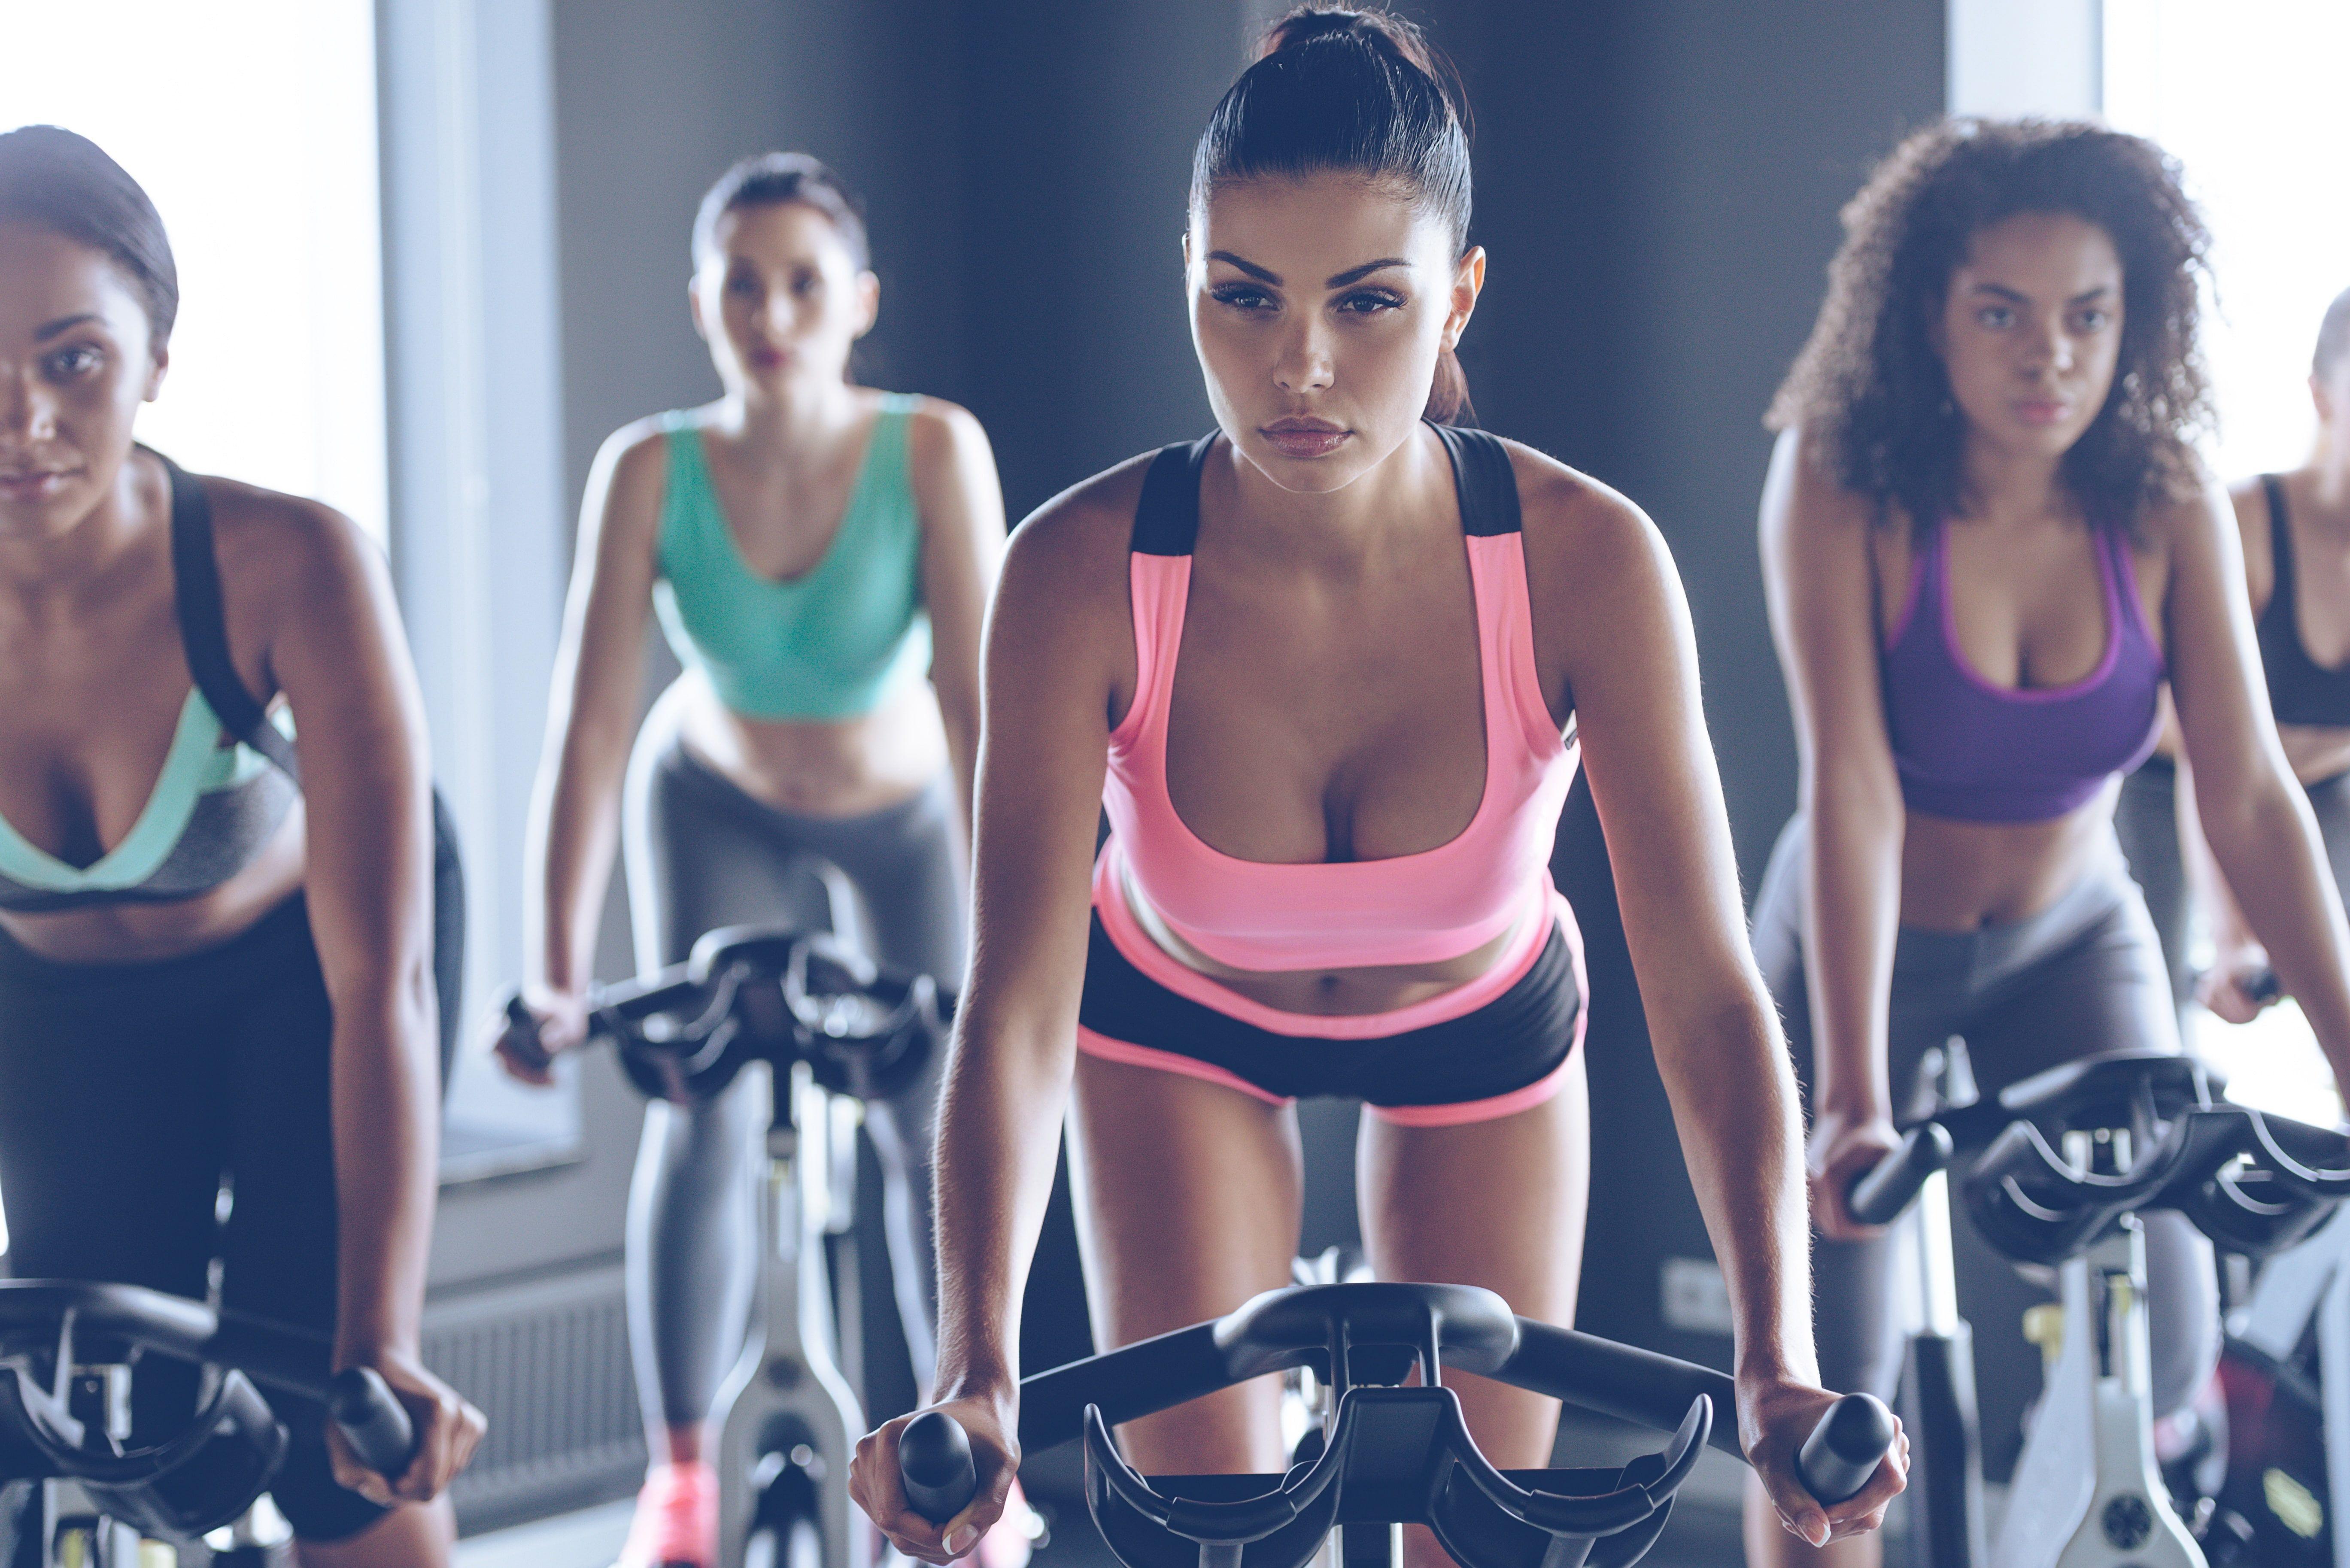 women's pink, teal, and purple sports bras #workout #bikes #Fitness #females #5K #wallpaper #hdwallp...